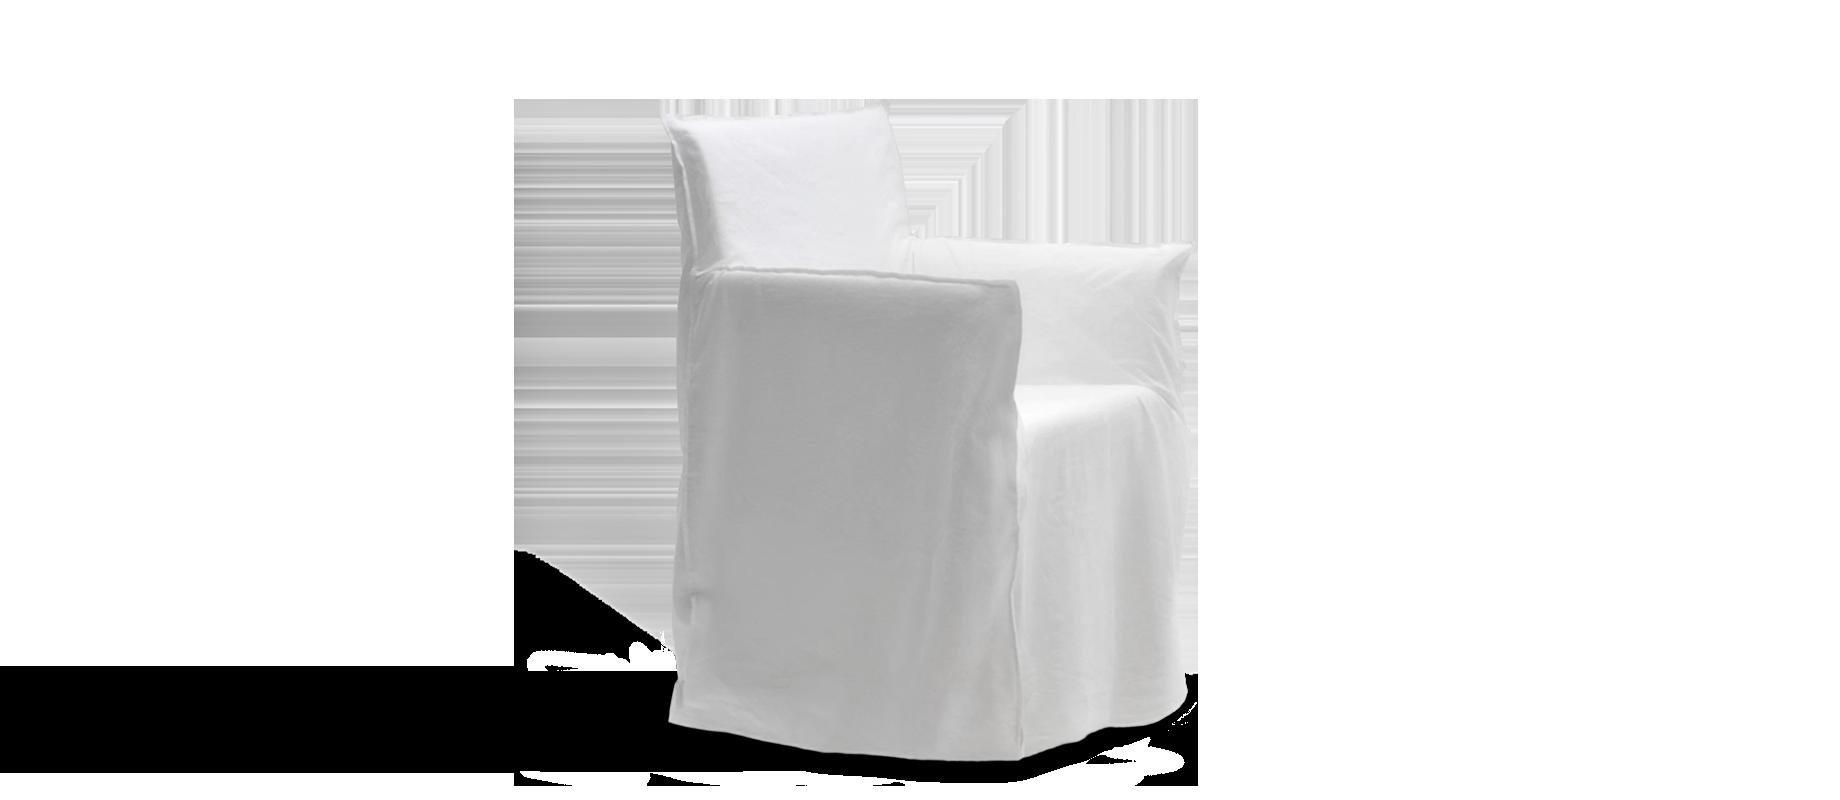 plexiglas stol fabulous seat andwhite with plexiglas stol gallery of leau stapelstol. Black Bedroom Furniture Sets. Home Design Ideas